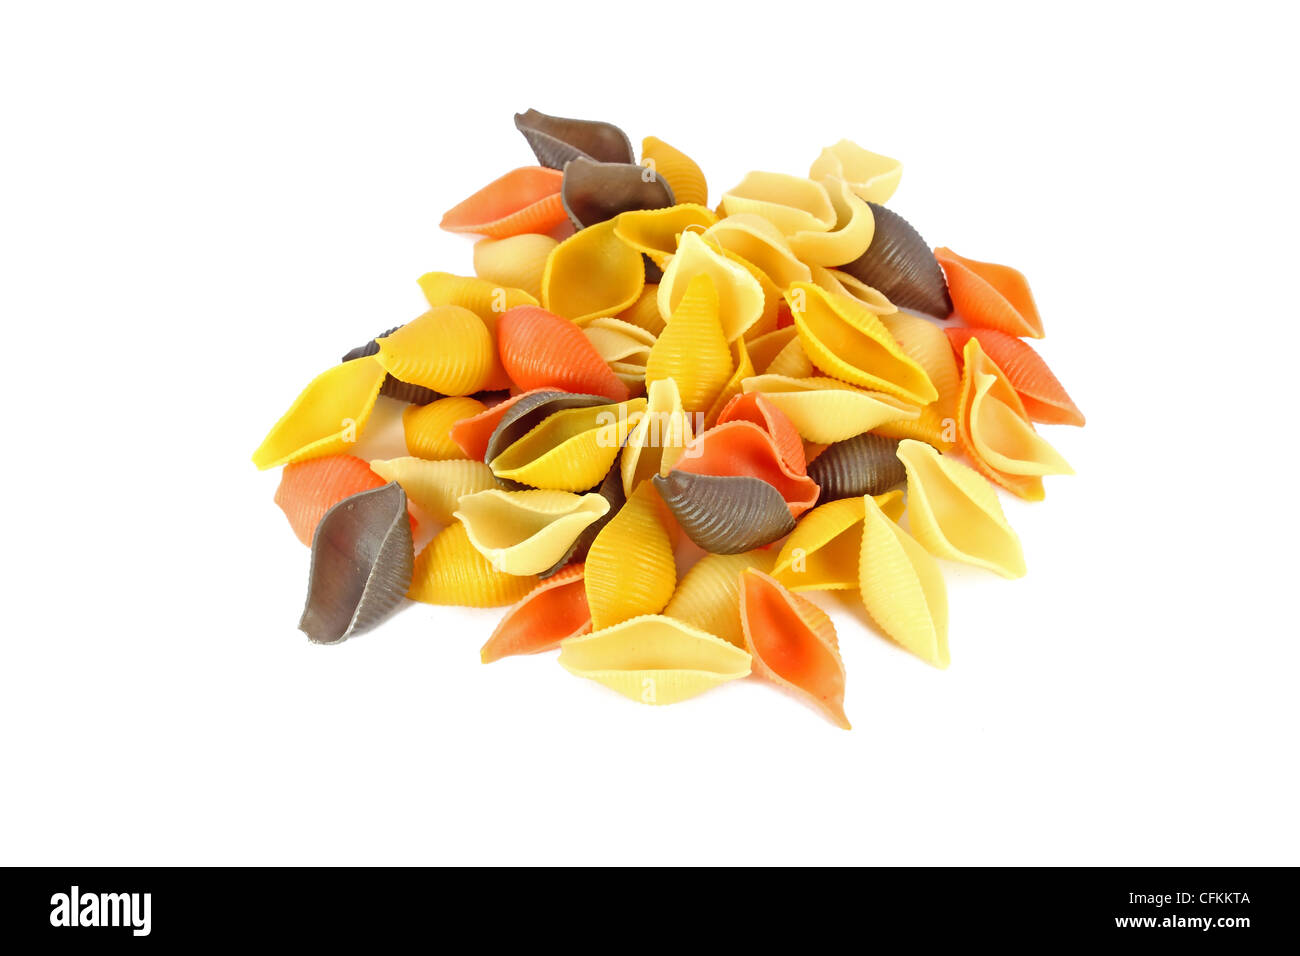 Montón de conchas de pasta de color crudo aislado en blanco Imagen De Stock